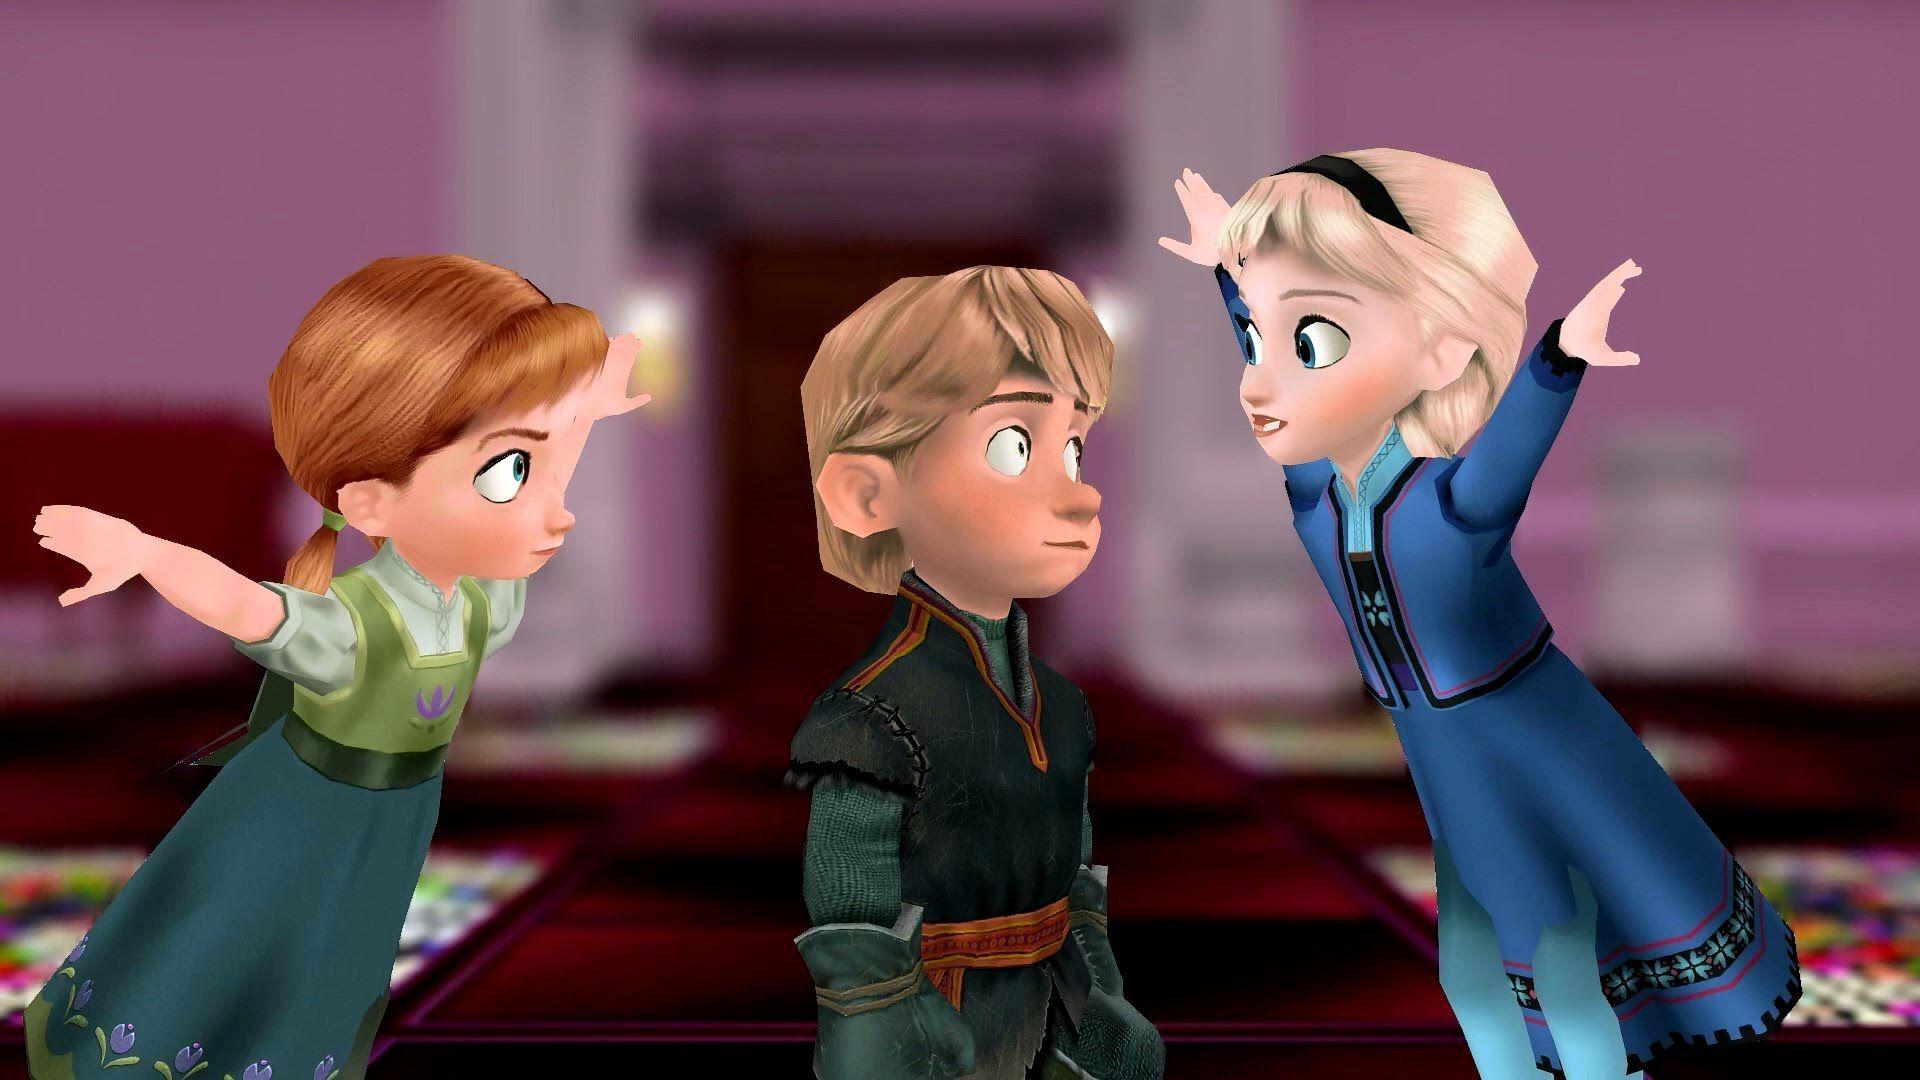 Mmd Warning Loud Little Anna Vs Little Elsa This Is Talking Carl Funny Frozen Meme Disney Characters Videos Disney Disney Youtube